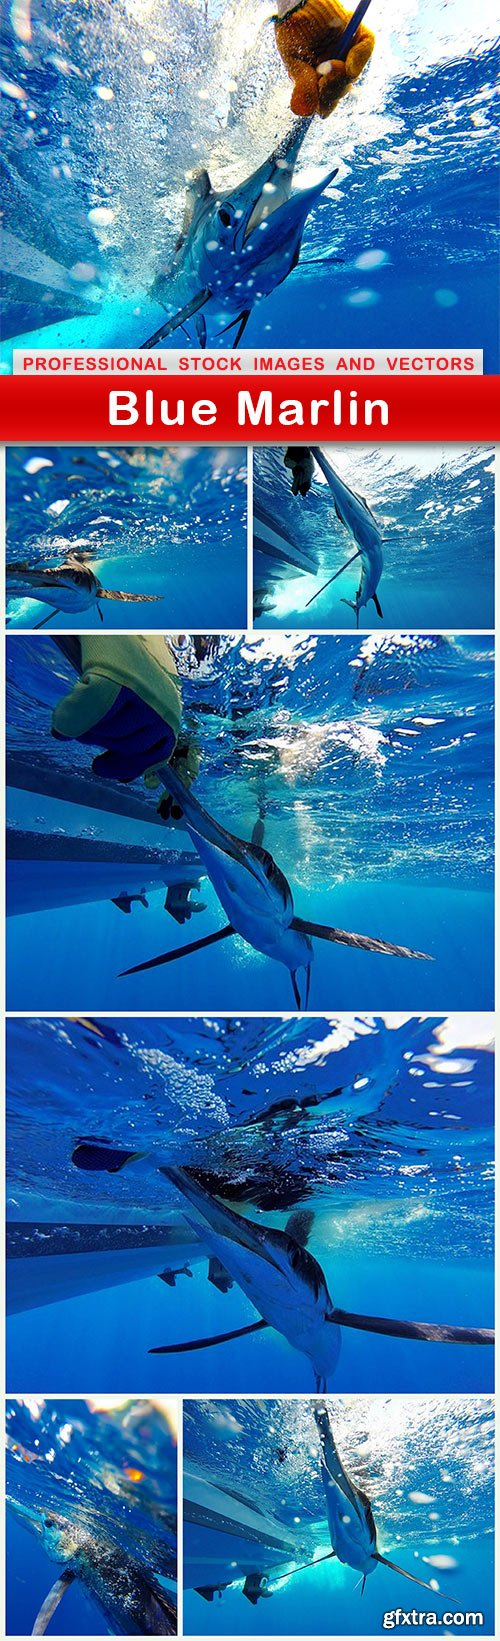 Blue Marlin - 7 UHQ JPEG